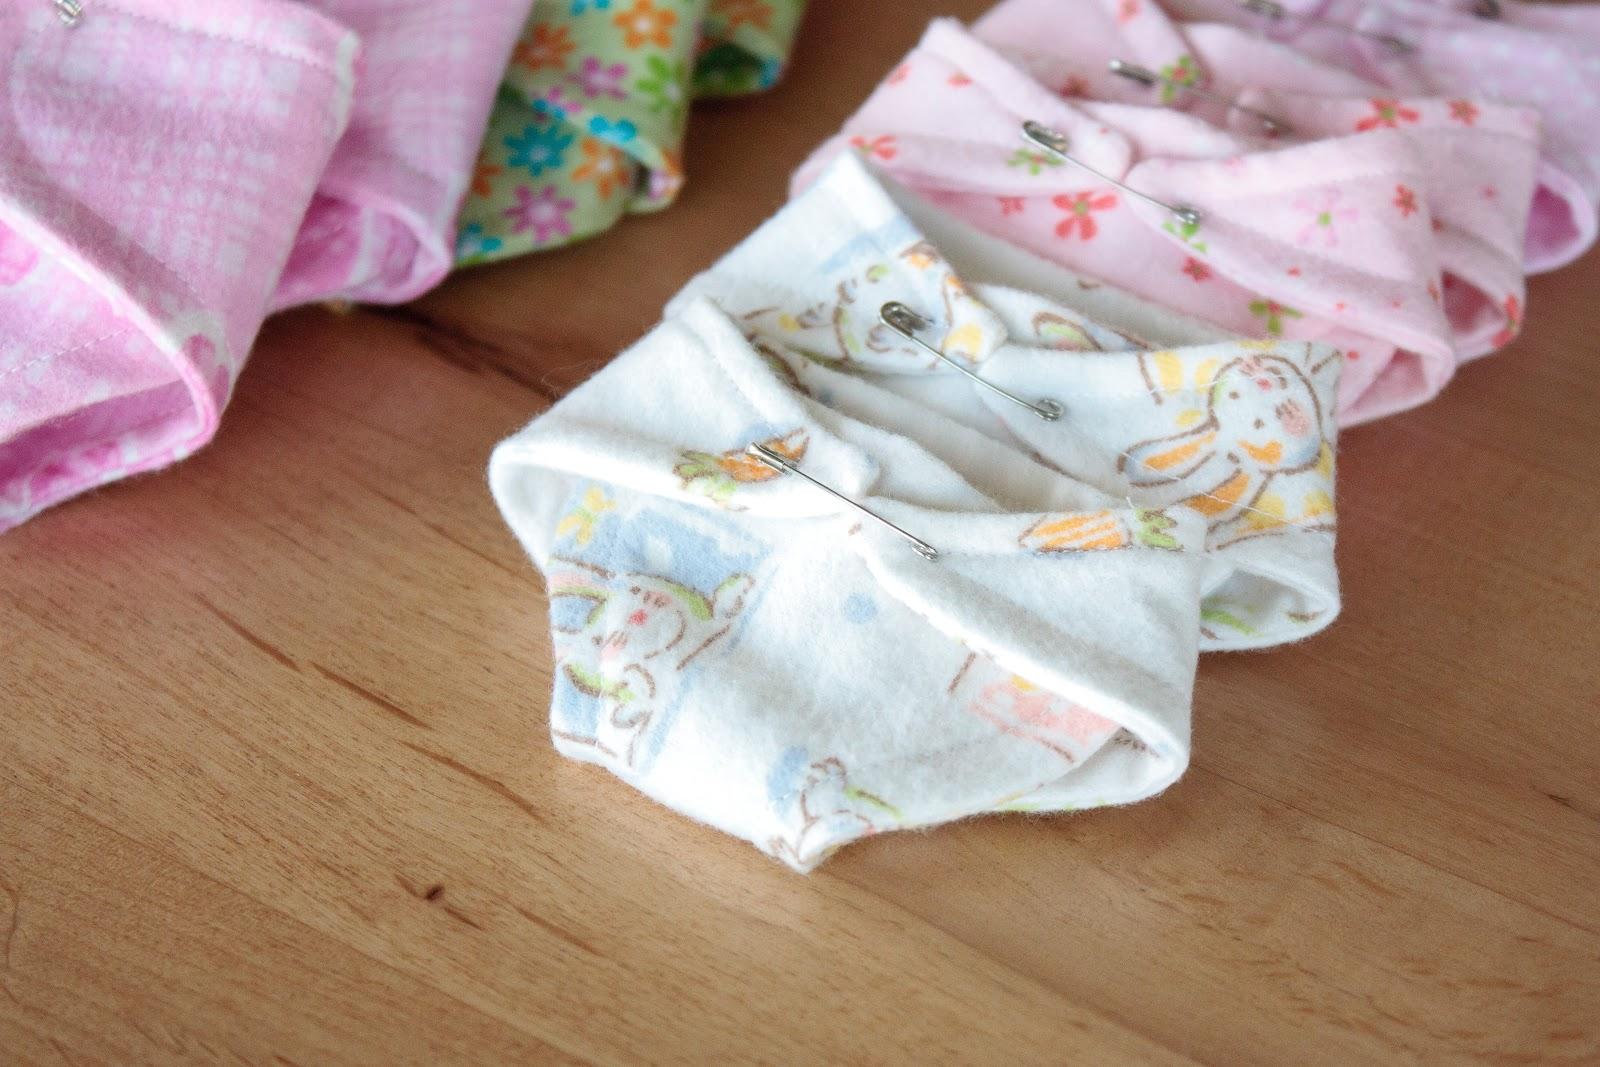 ariverton diapers2b.jpg